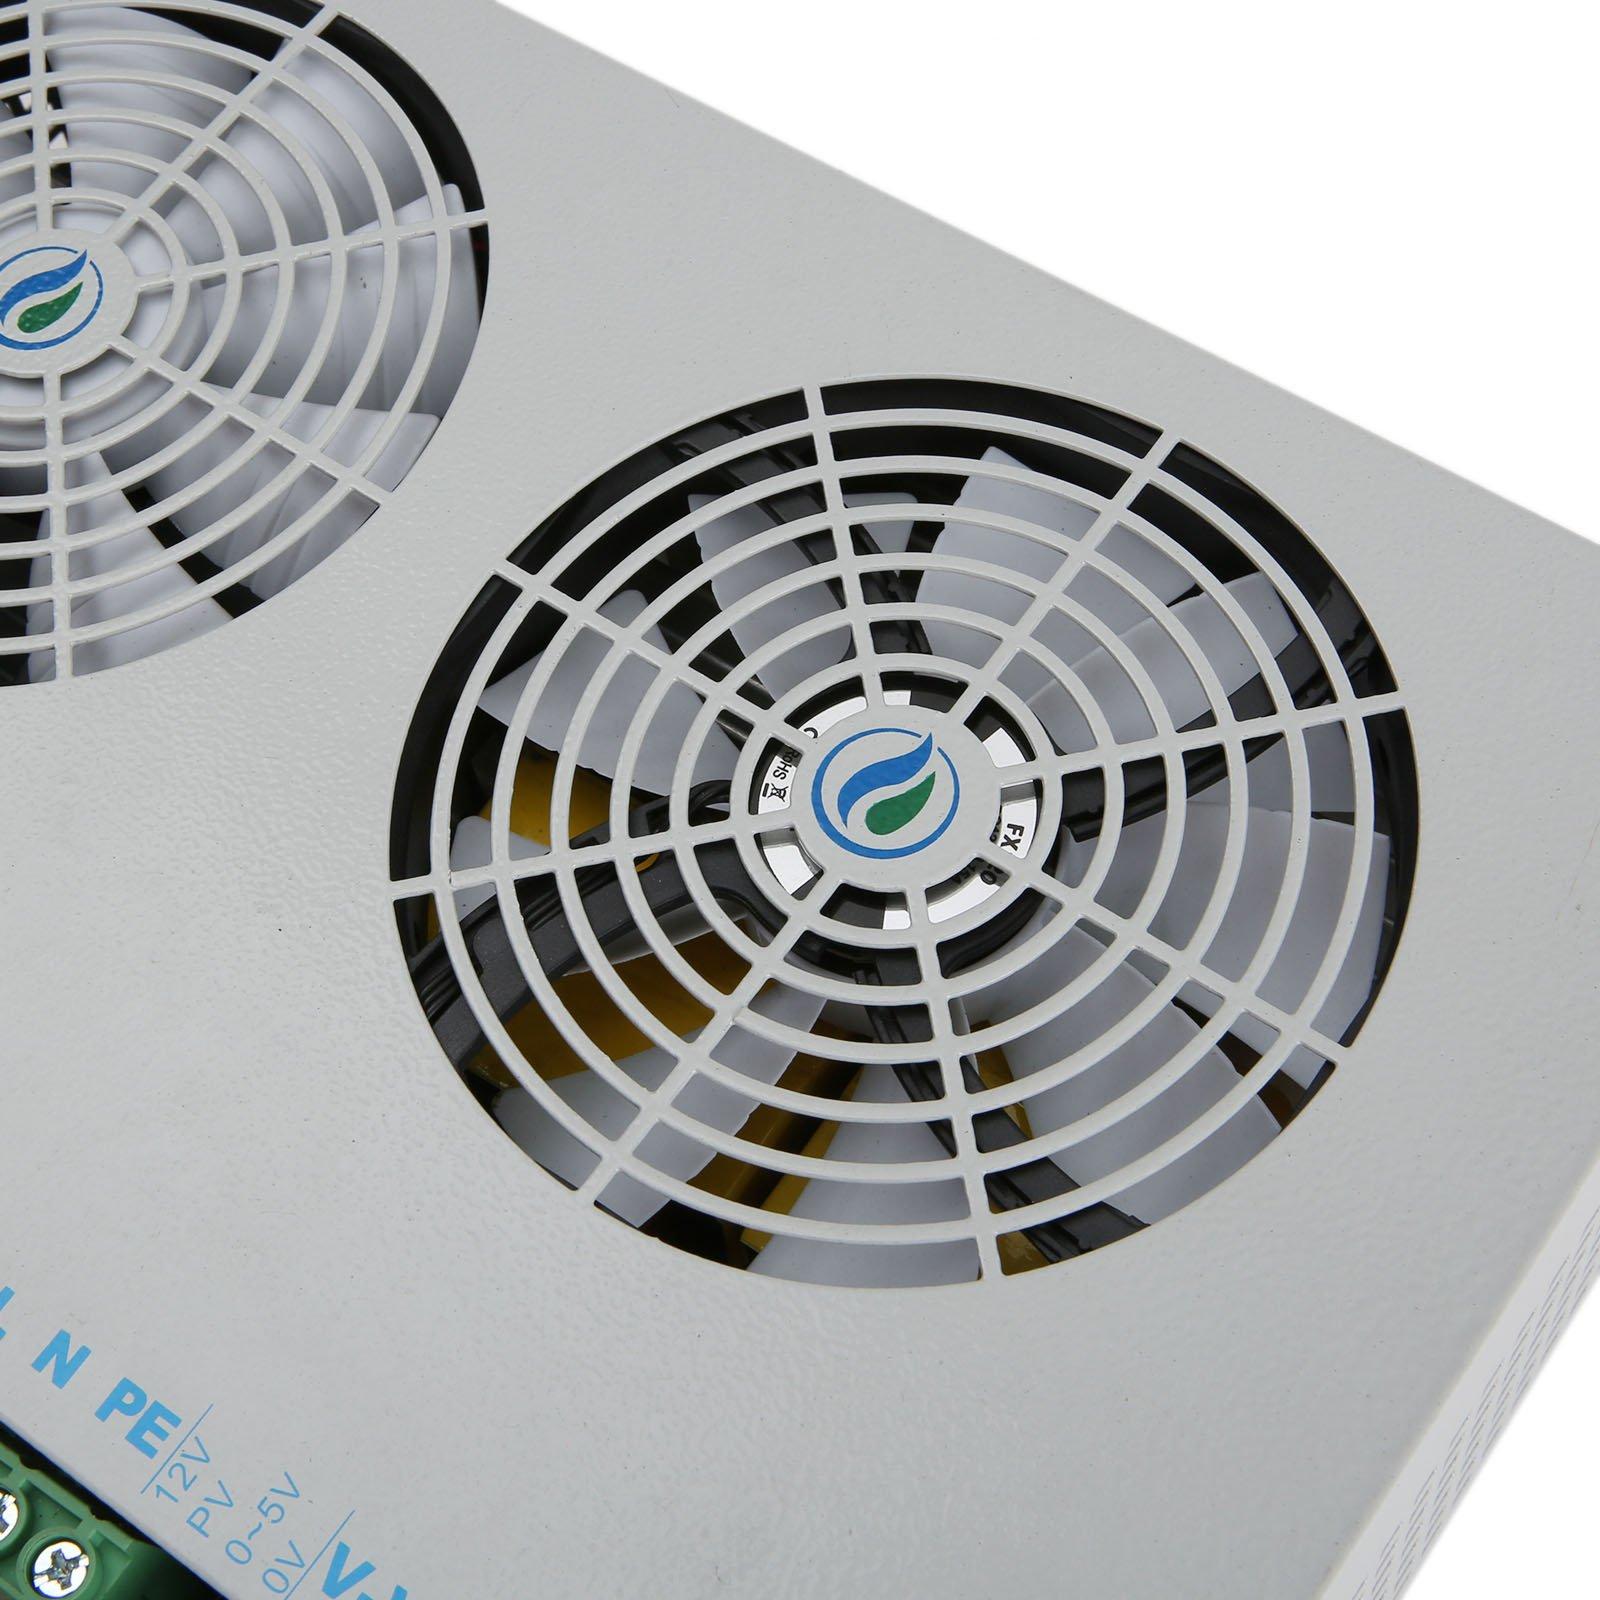 2000W AC/DC Switch Power Supply Transformer Output Voltage 36/24V DC Maintenance Free Energy Efficient